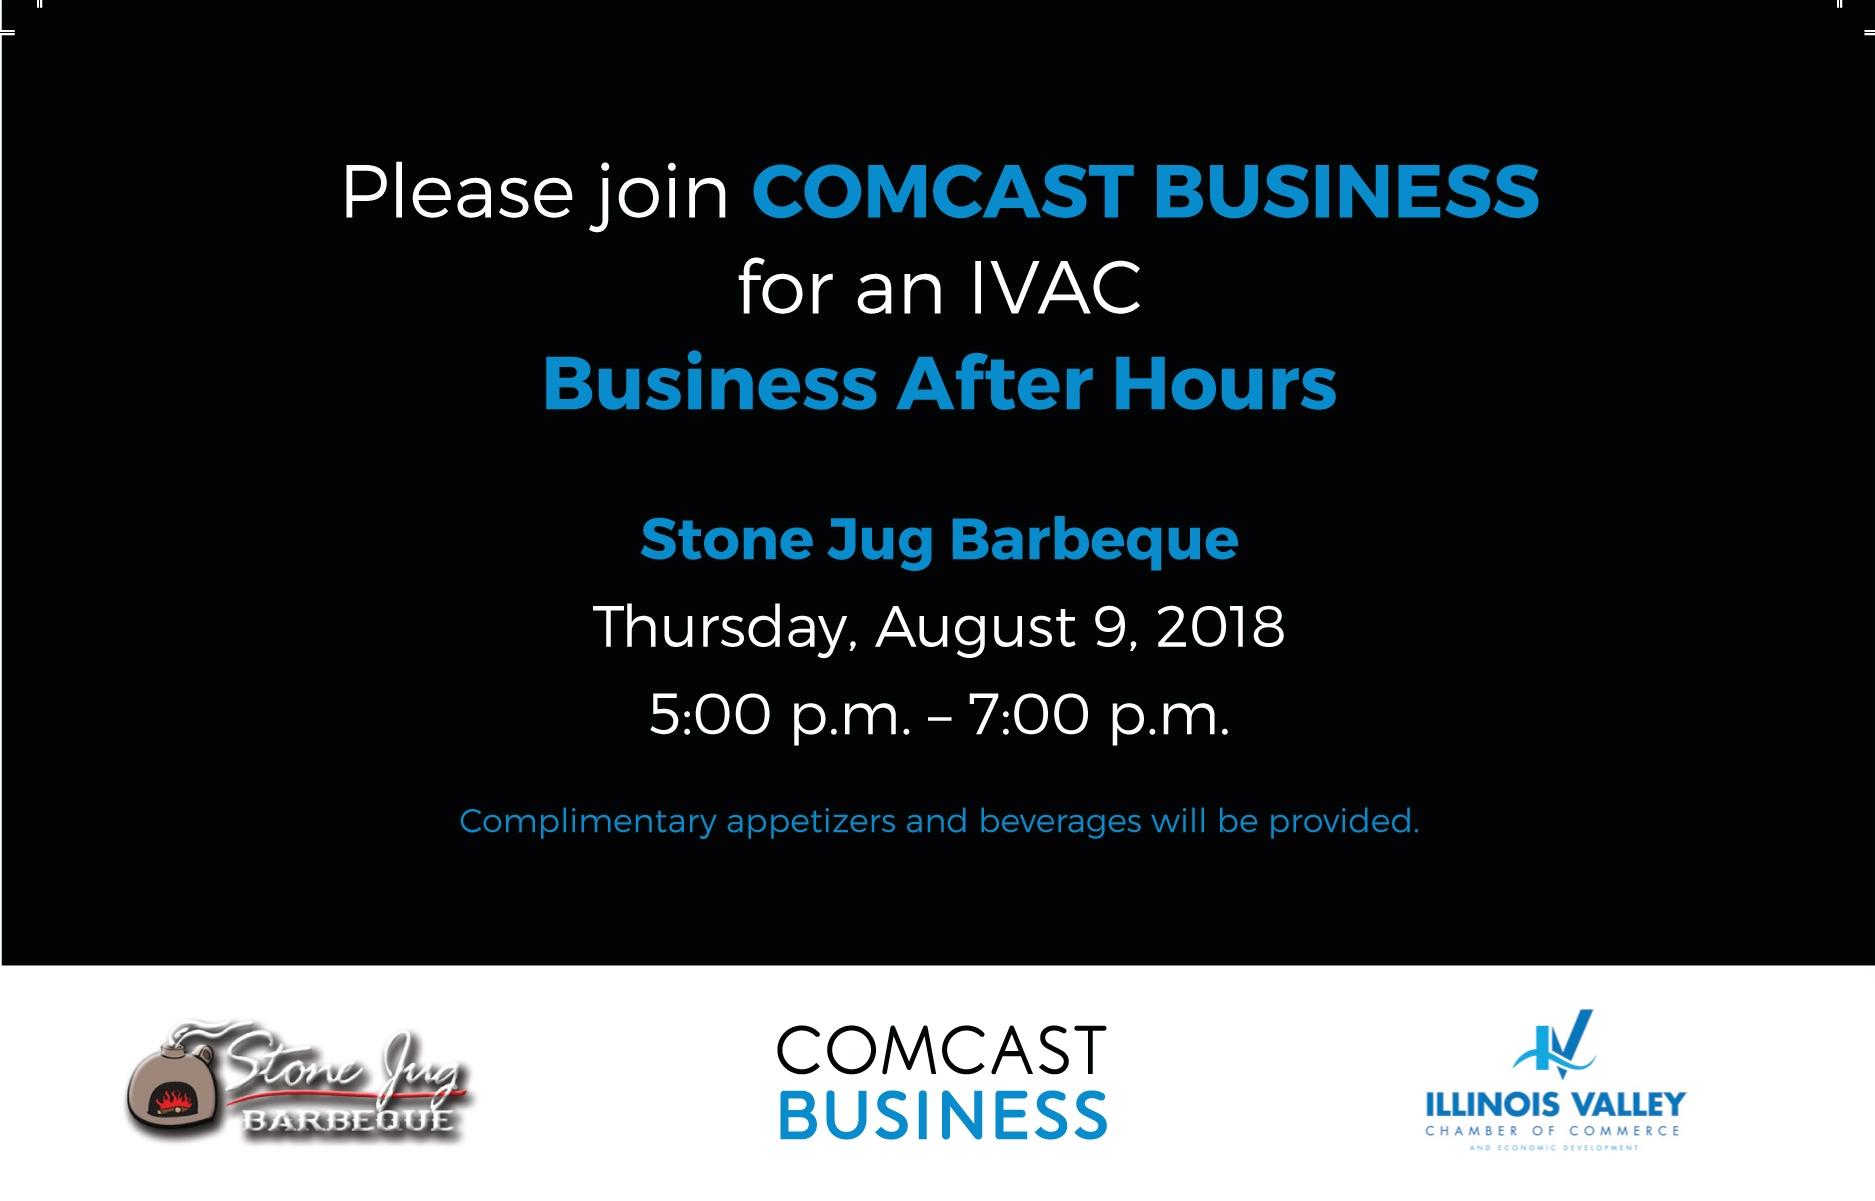 Comcast BAH invite